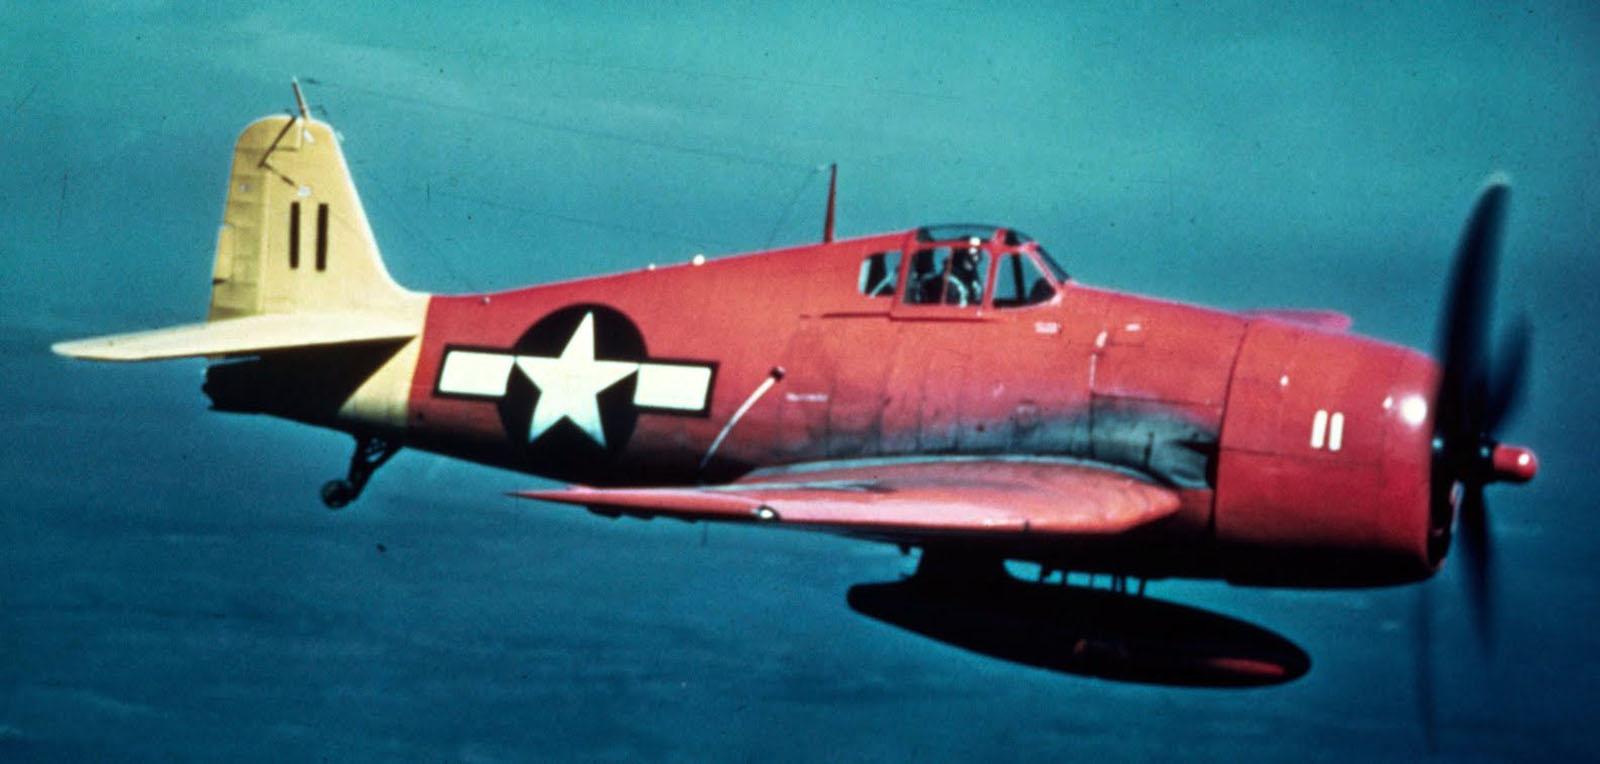 Grumman F6F 5K Hellcat No 11 drone and target aircraft post war 01